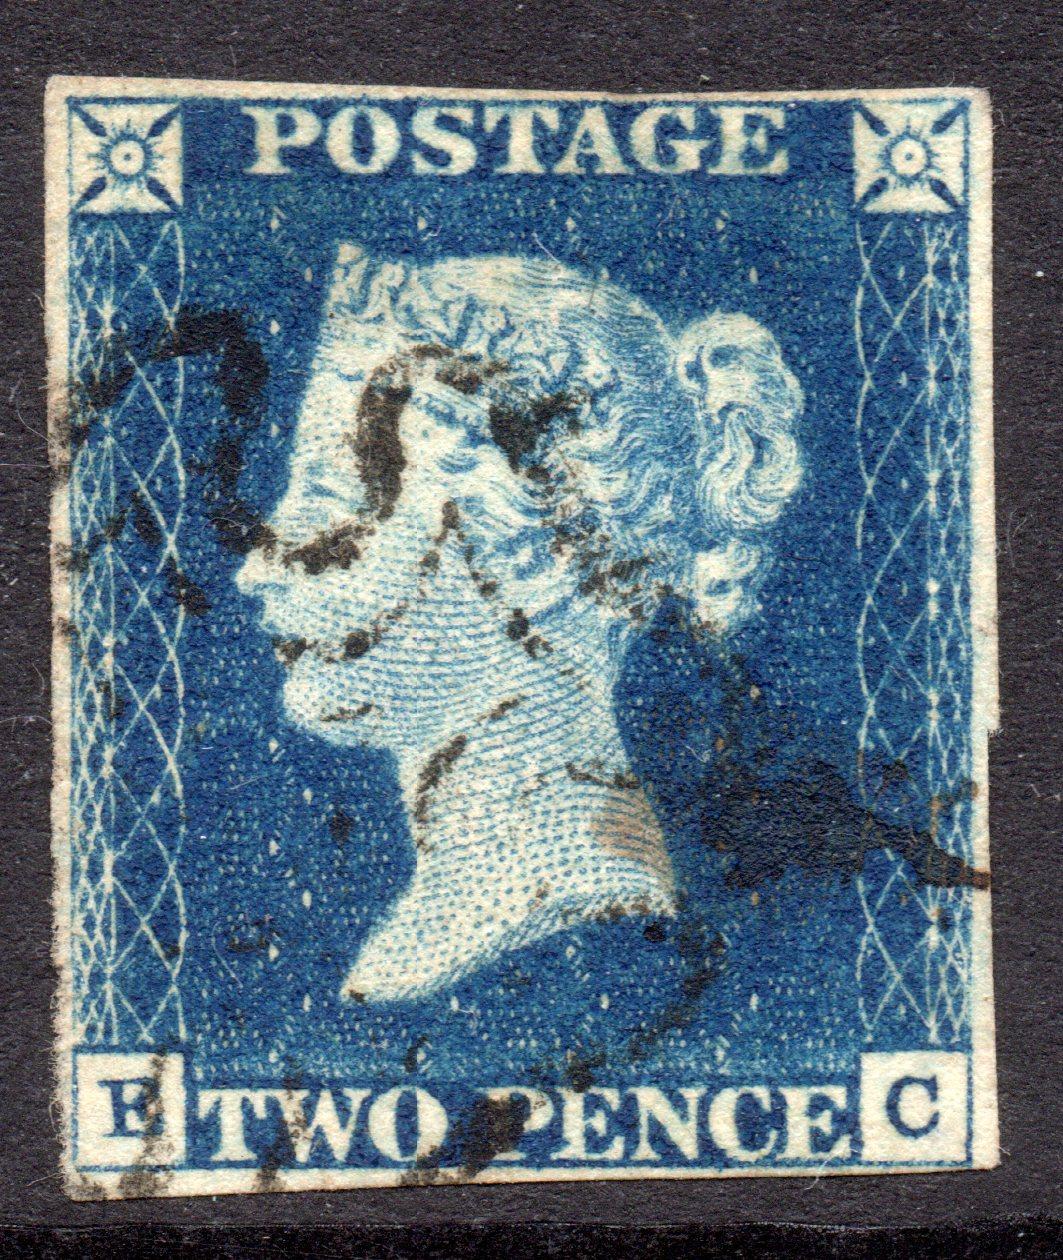 1840 2d Blue Plate 1 LIGHT BLACK MX - SOLD